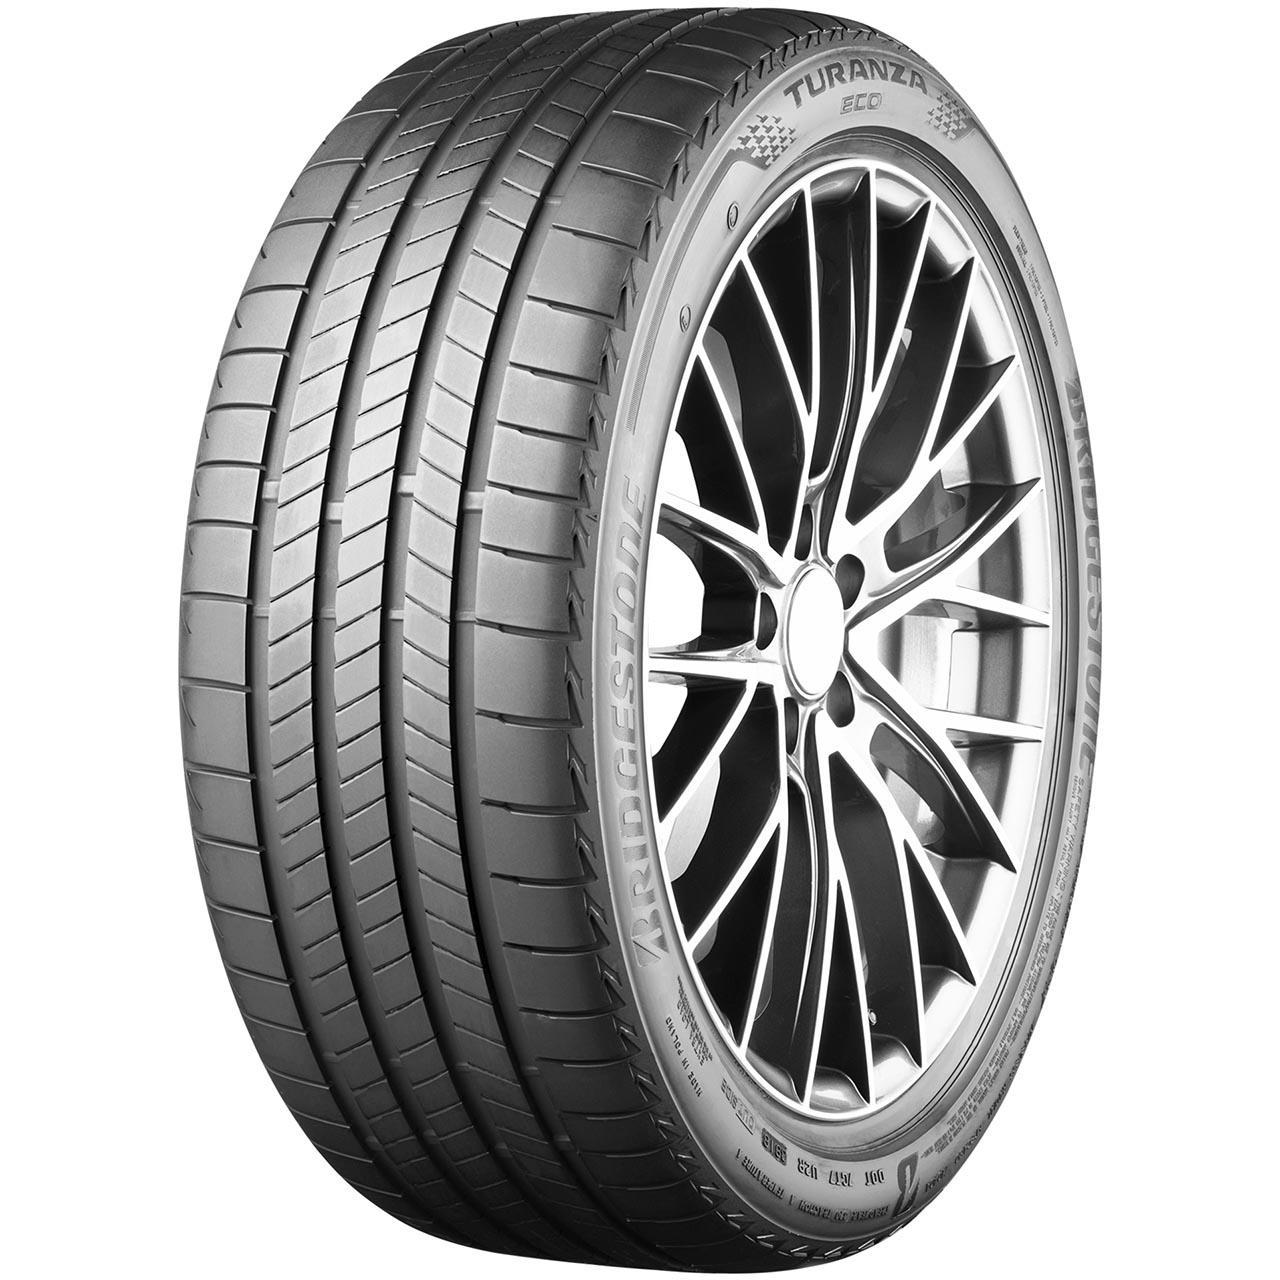 Bridgestone Turanza ECO 245/40R18 93H AO ENLITEN